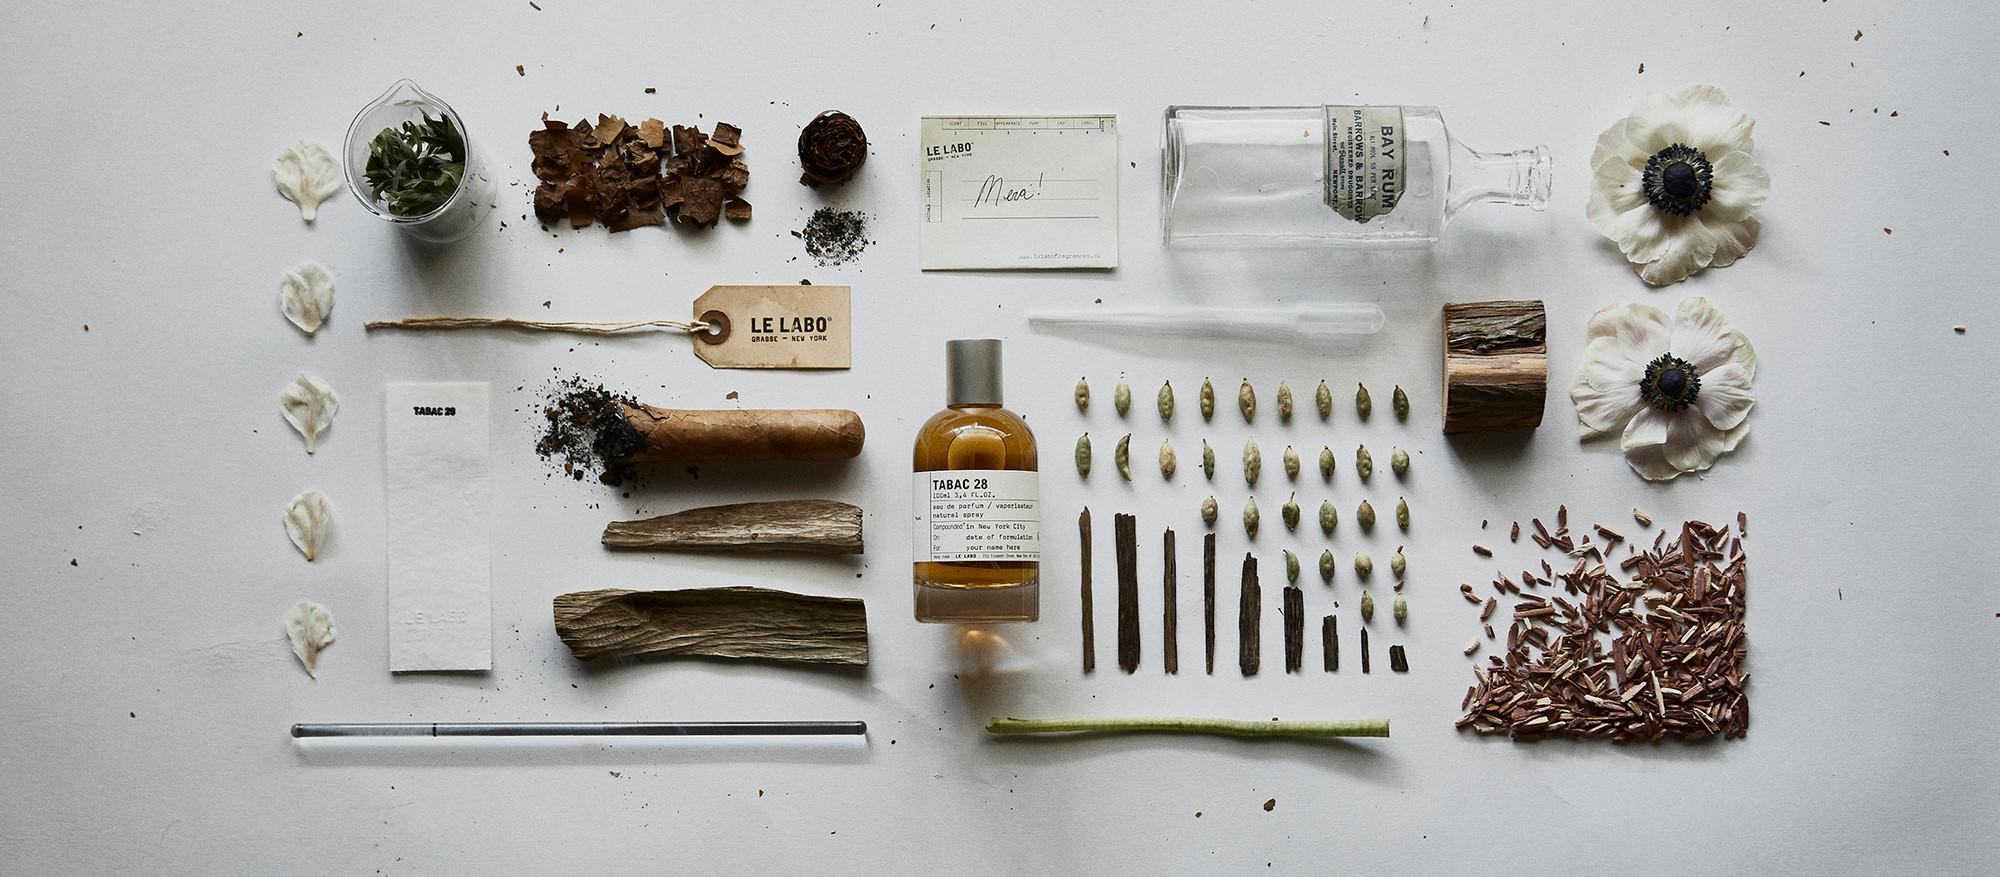 tabac 28